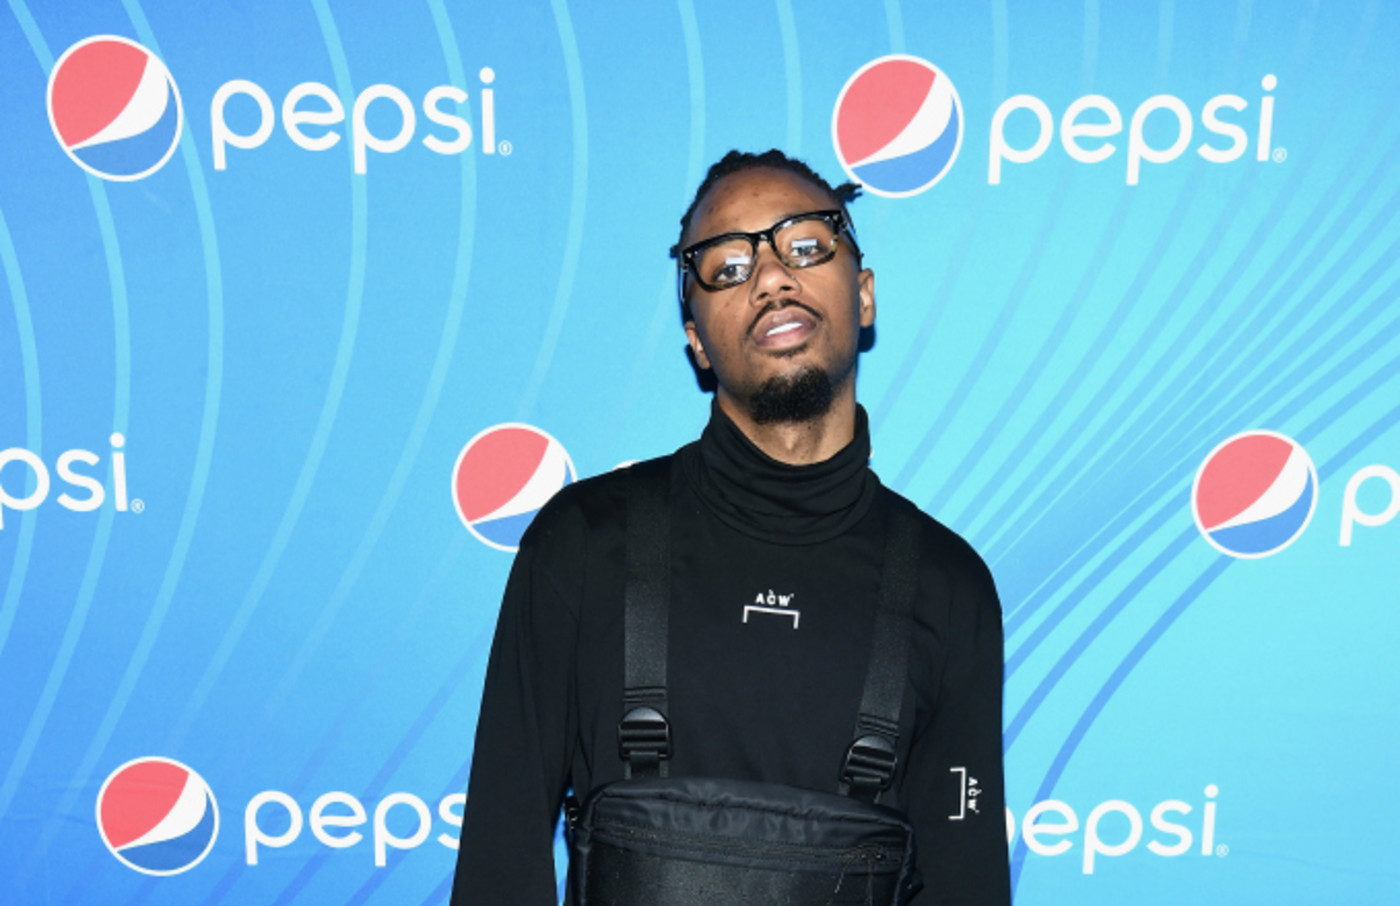 Metro Boomin attends 'Planet Pepsi' Pre-Super Bowl LIII party